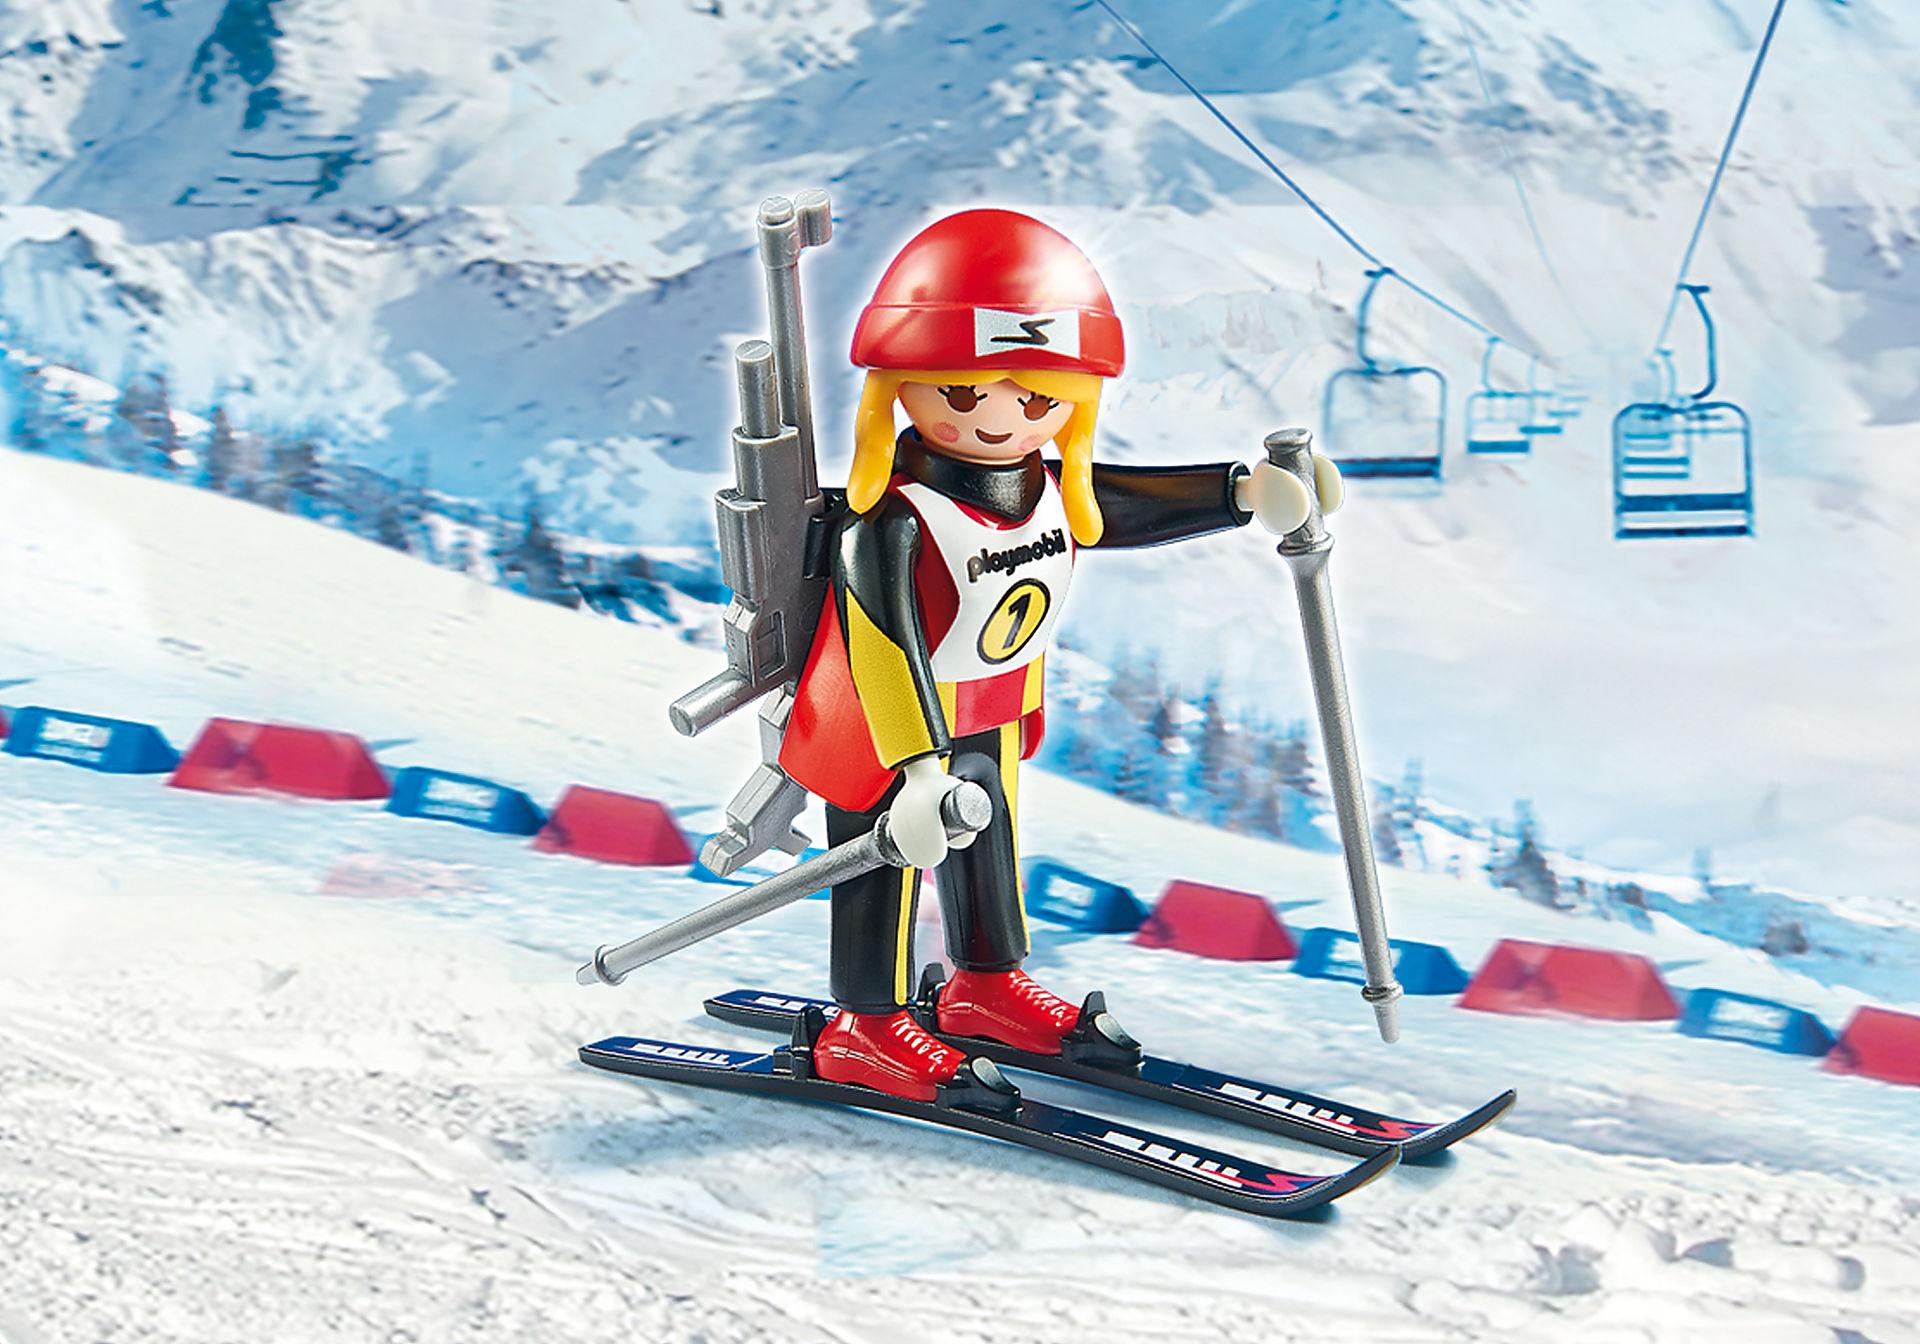 9287 Biathlonistka zoom image1